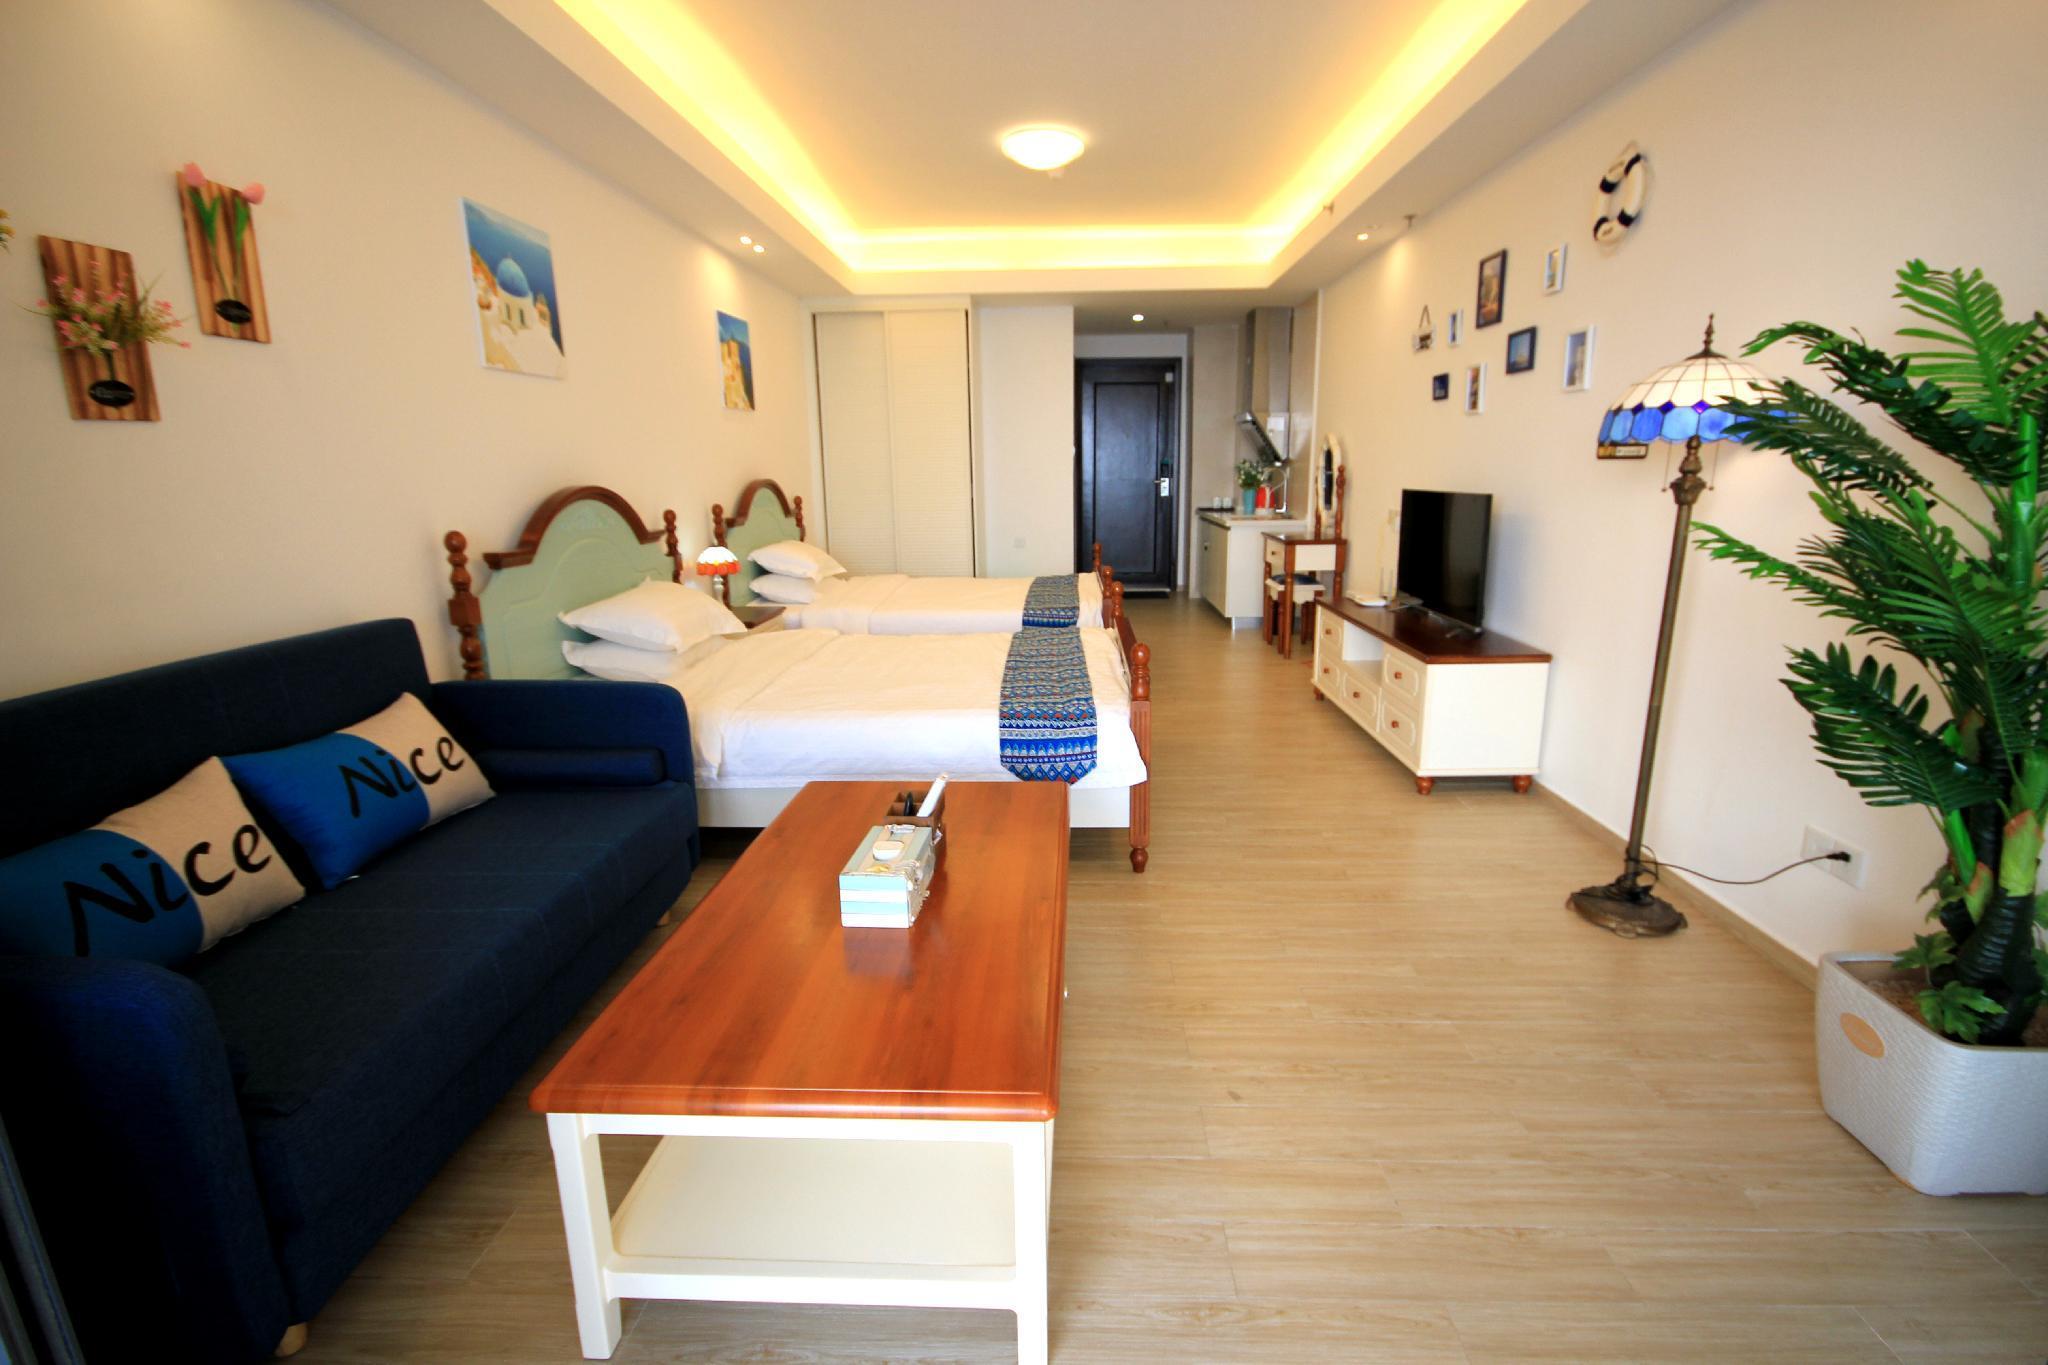 Hailing Island Seascape Double Room + Sofa Bed Reviews